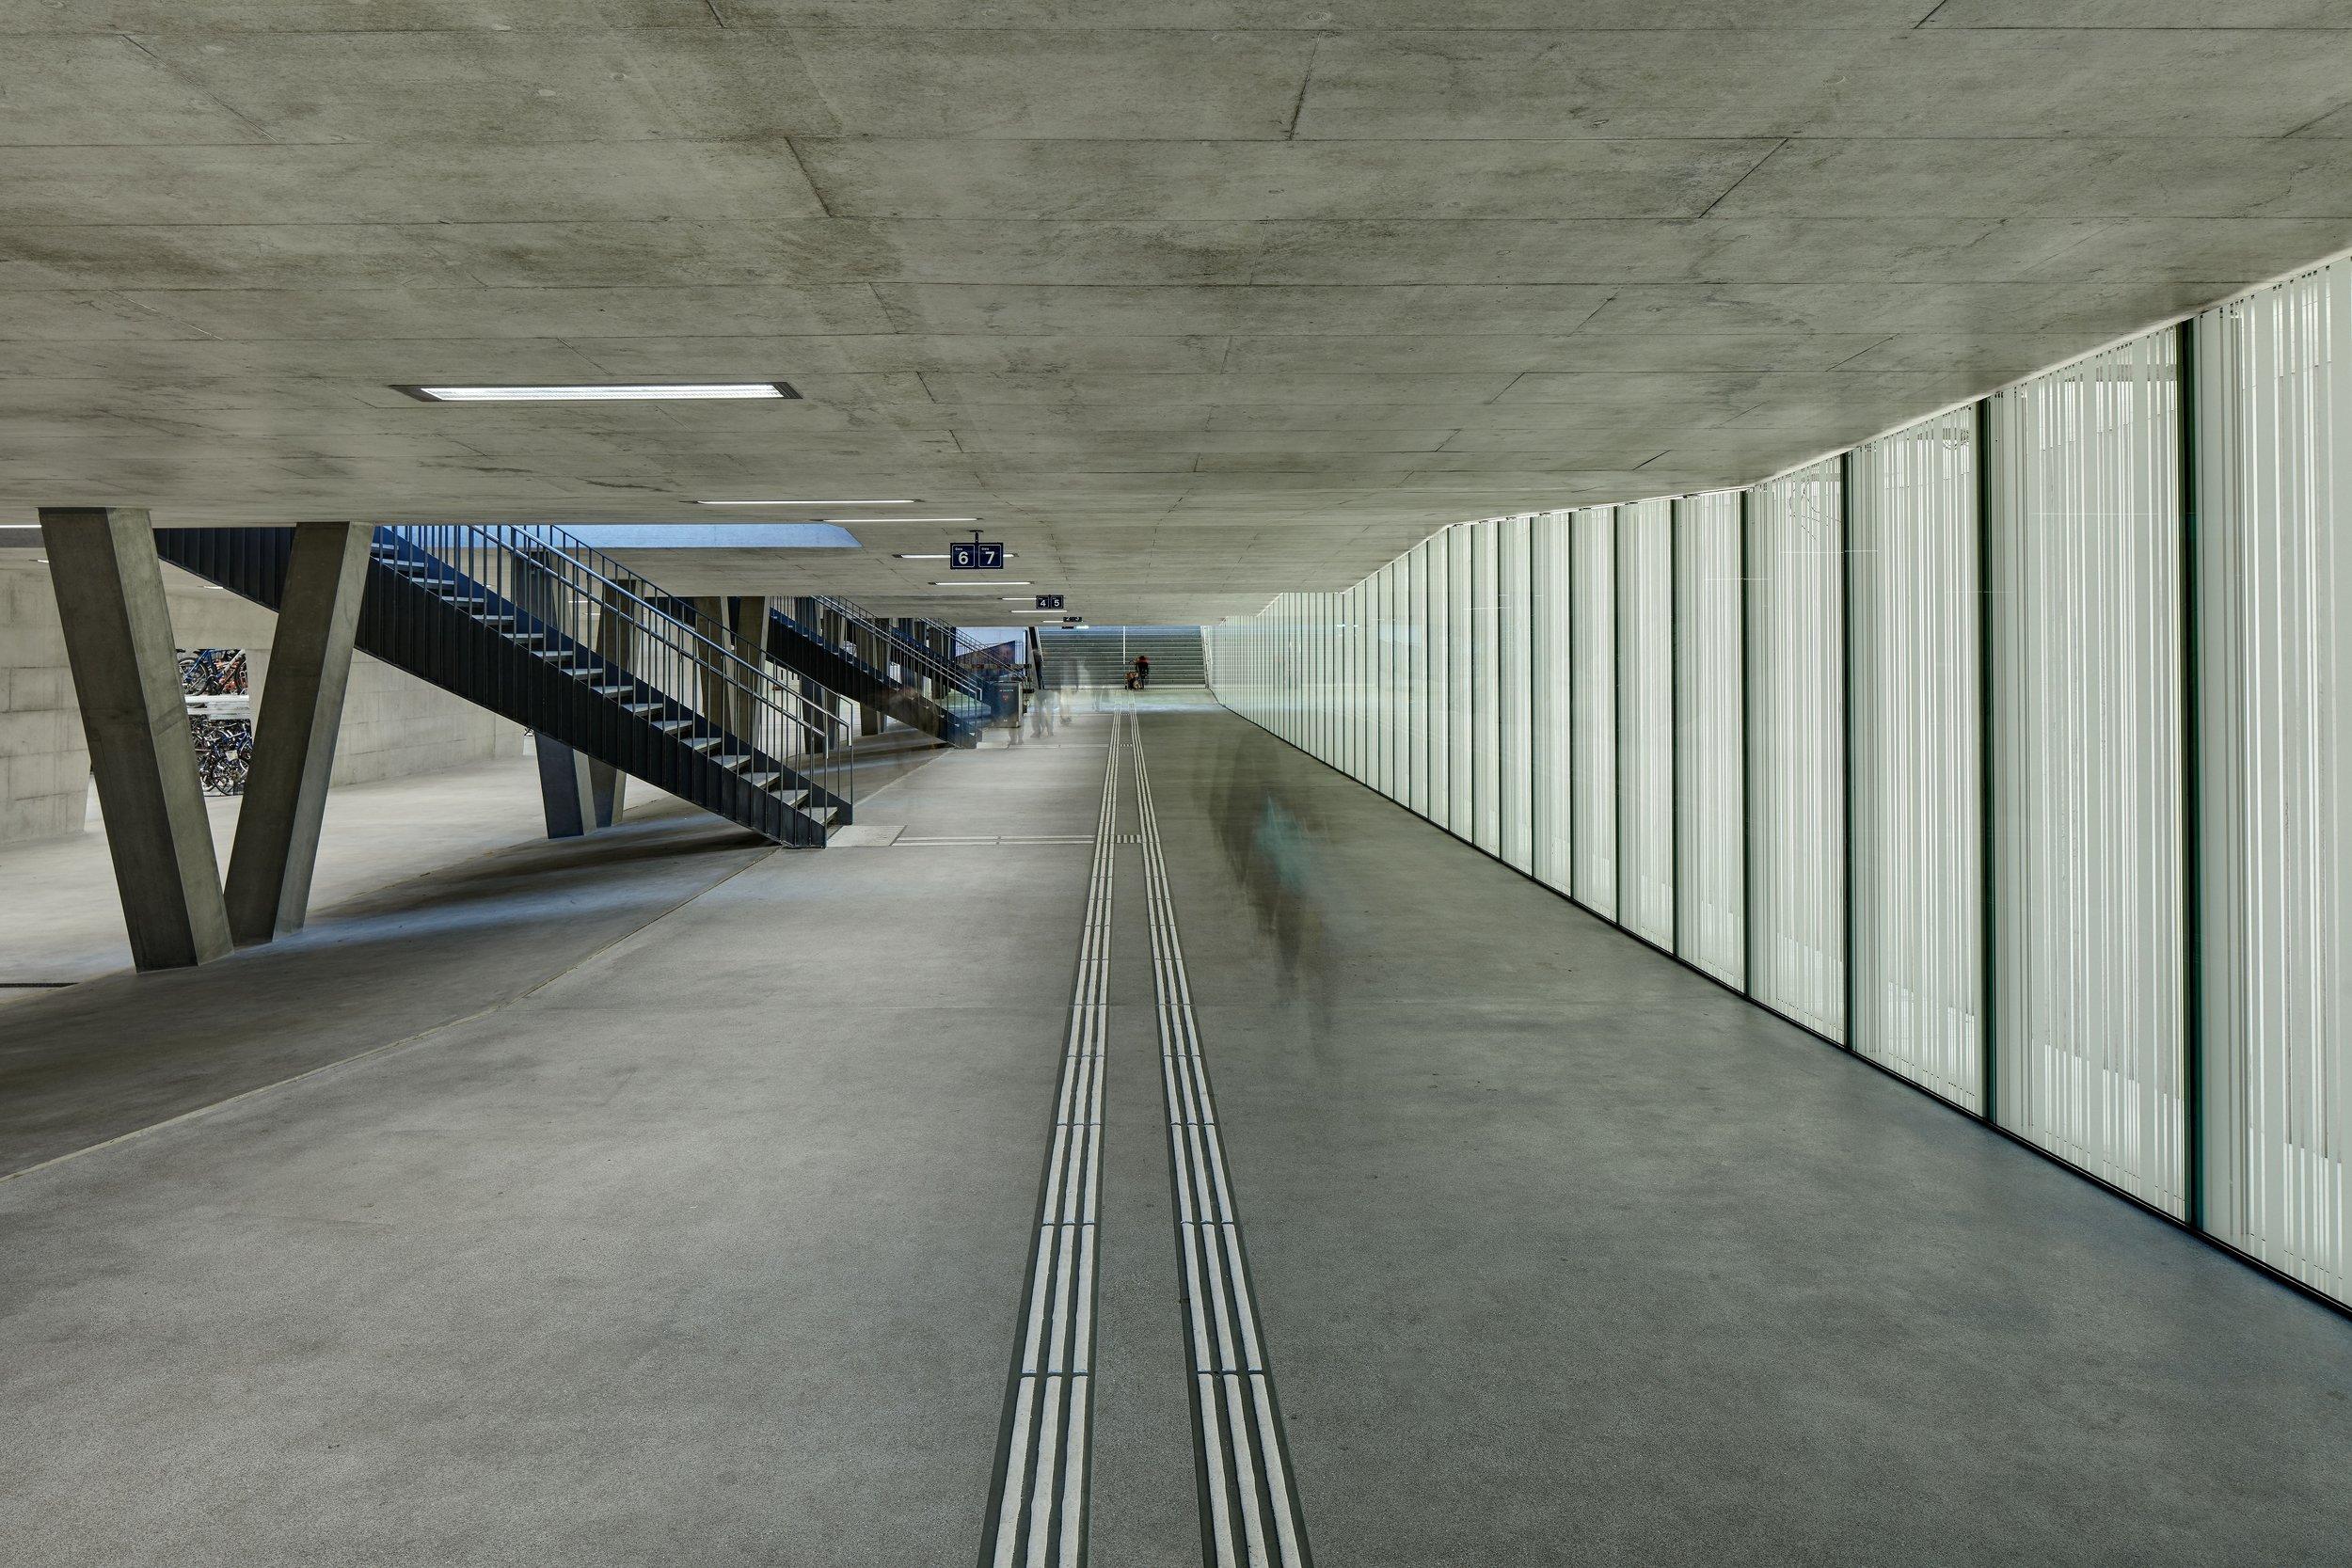 Bahnhof _Oerlikon_1_bearb.jpg